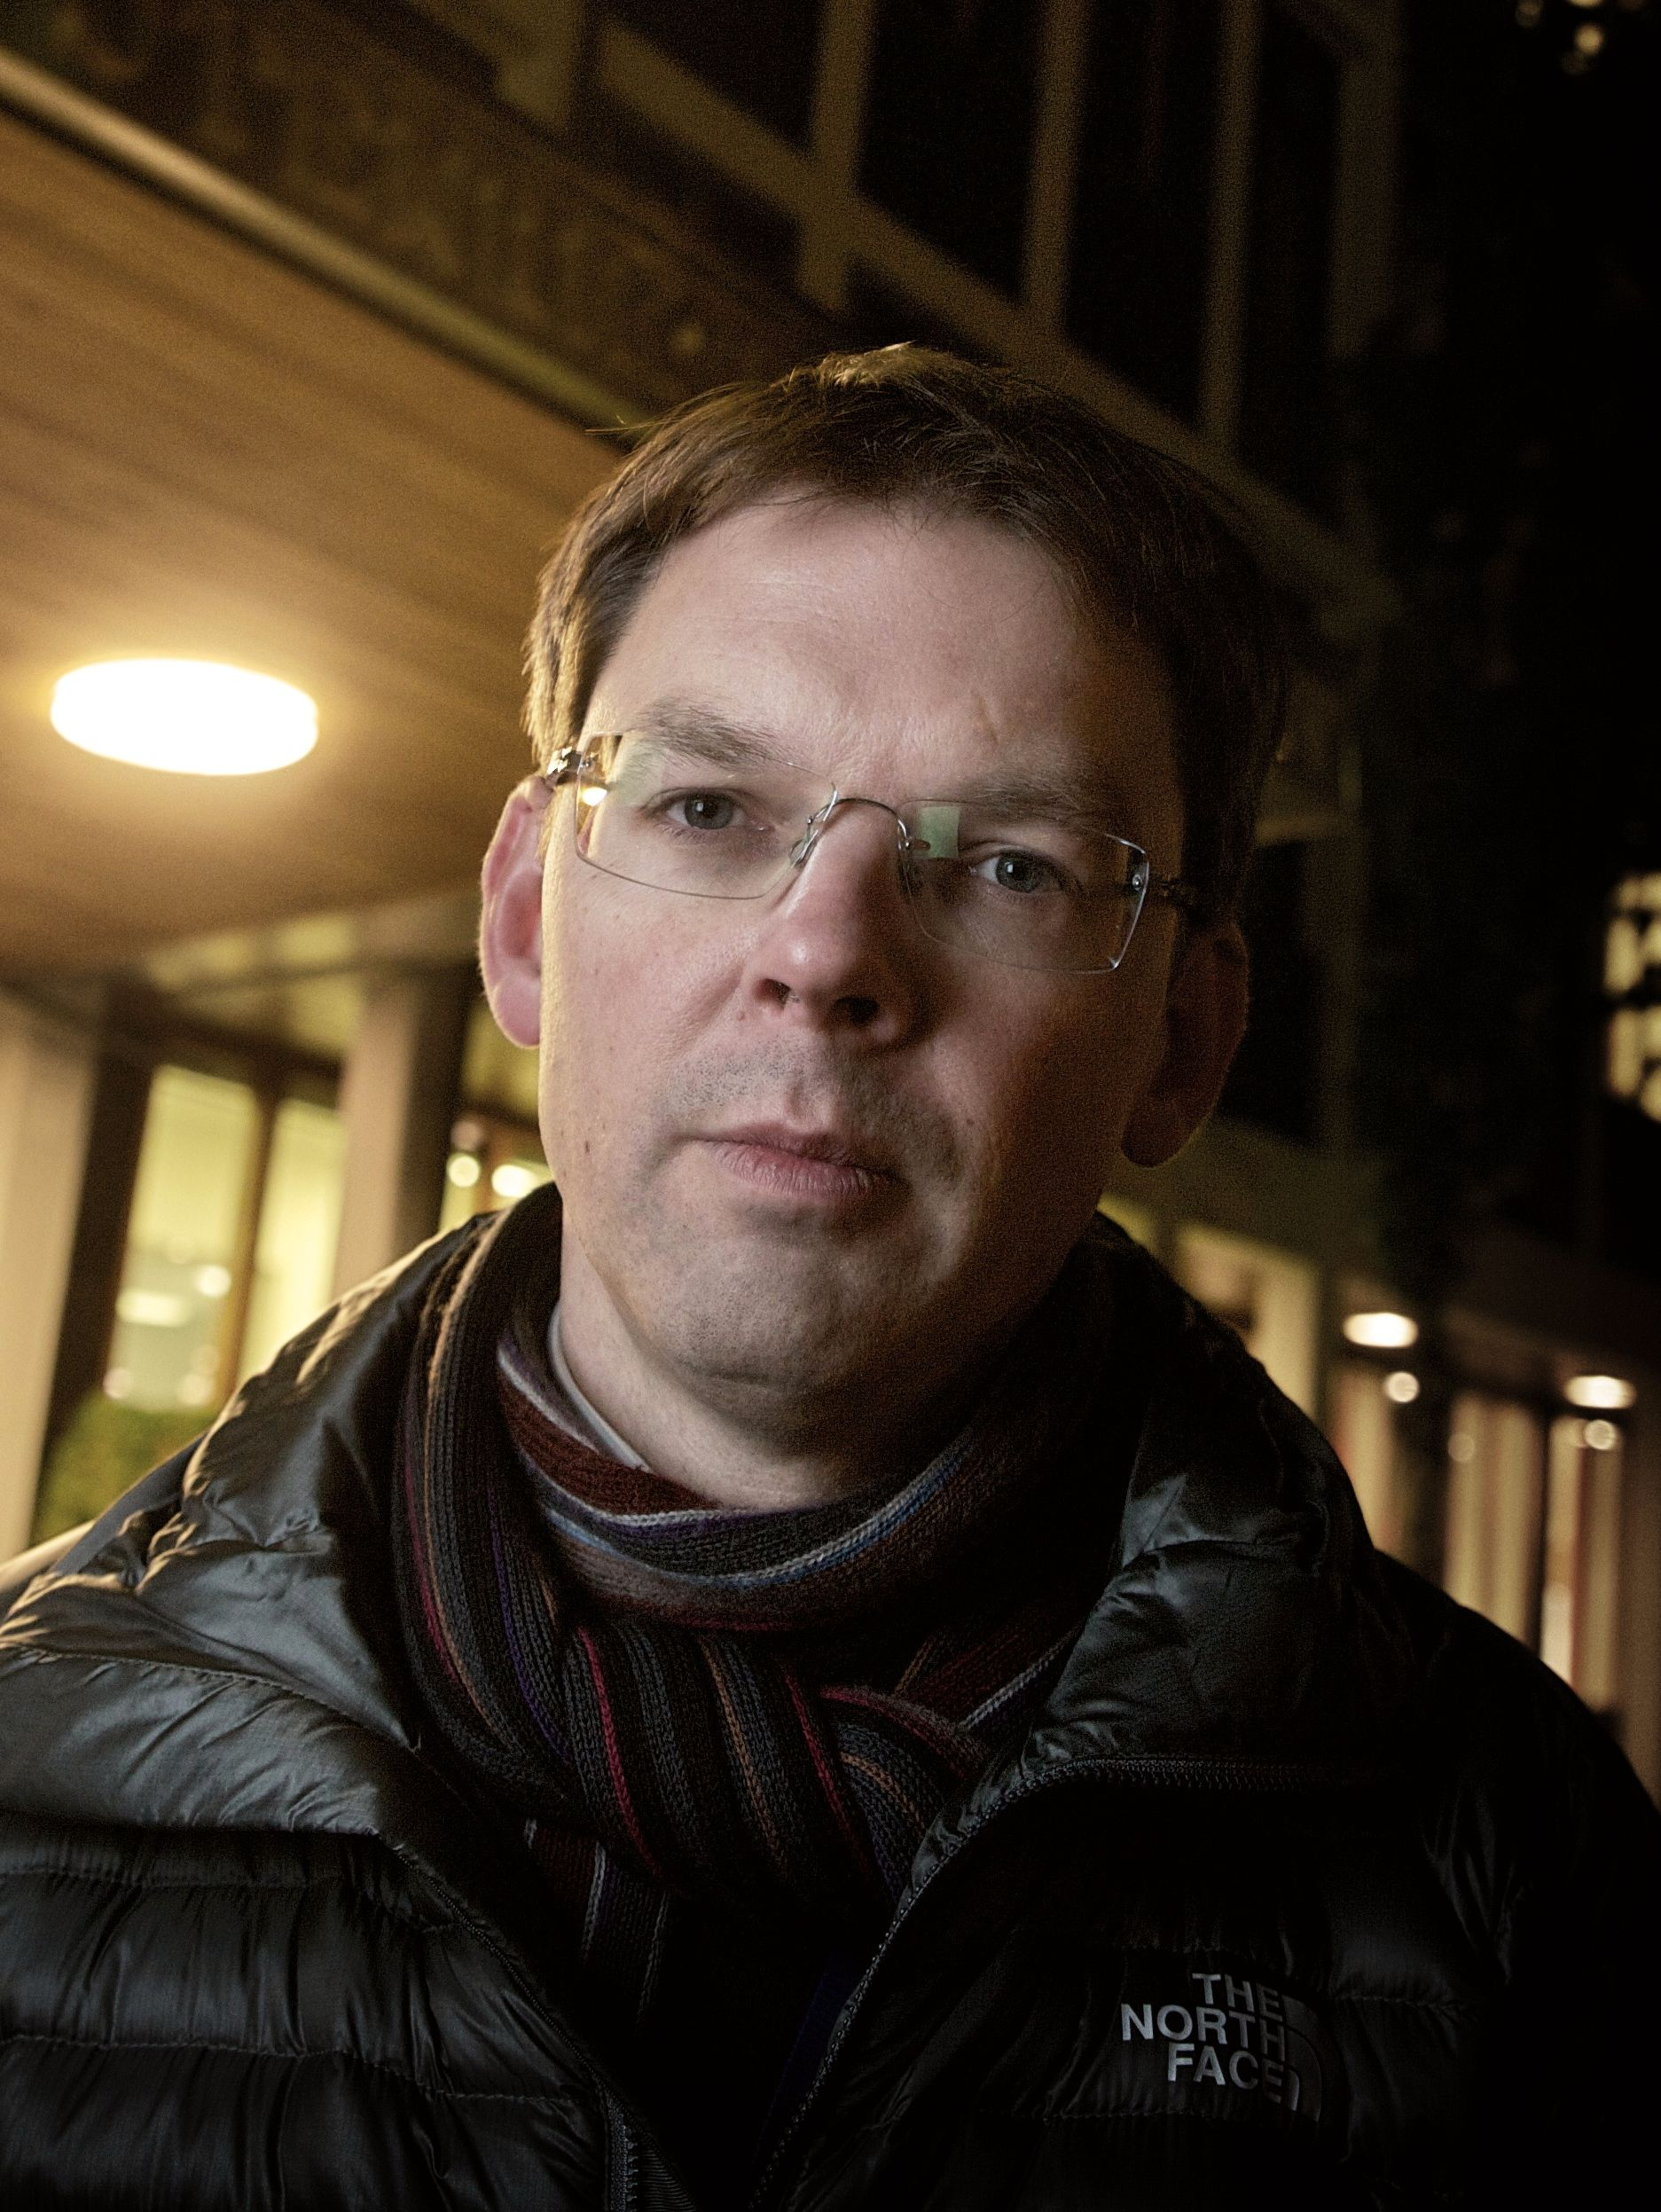 UD SVARER: Kommunikasjonssjef i UD Frode Andersen.